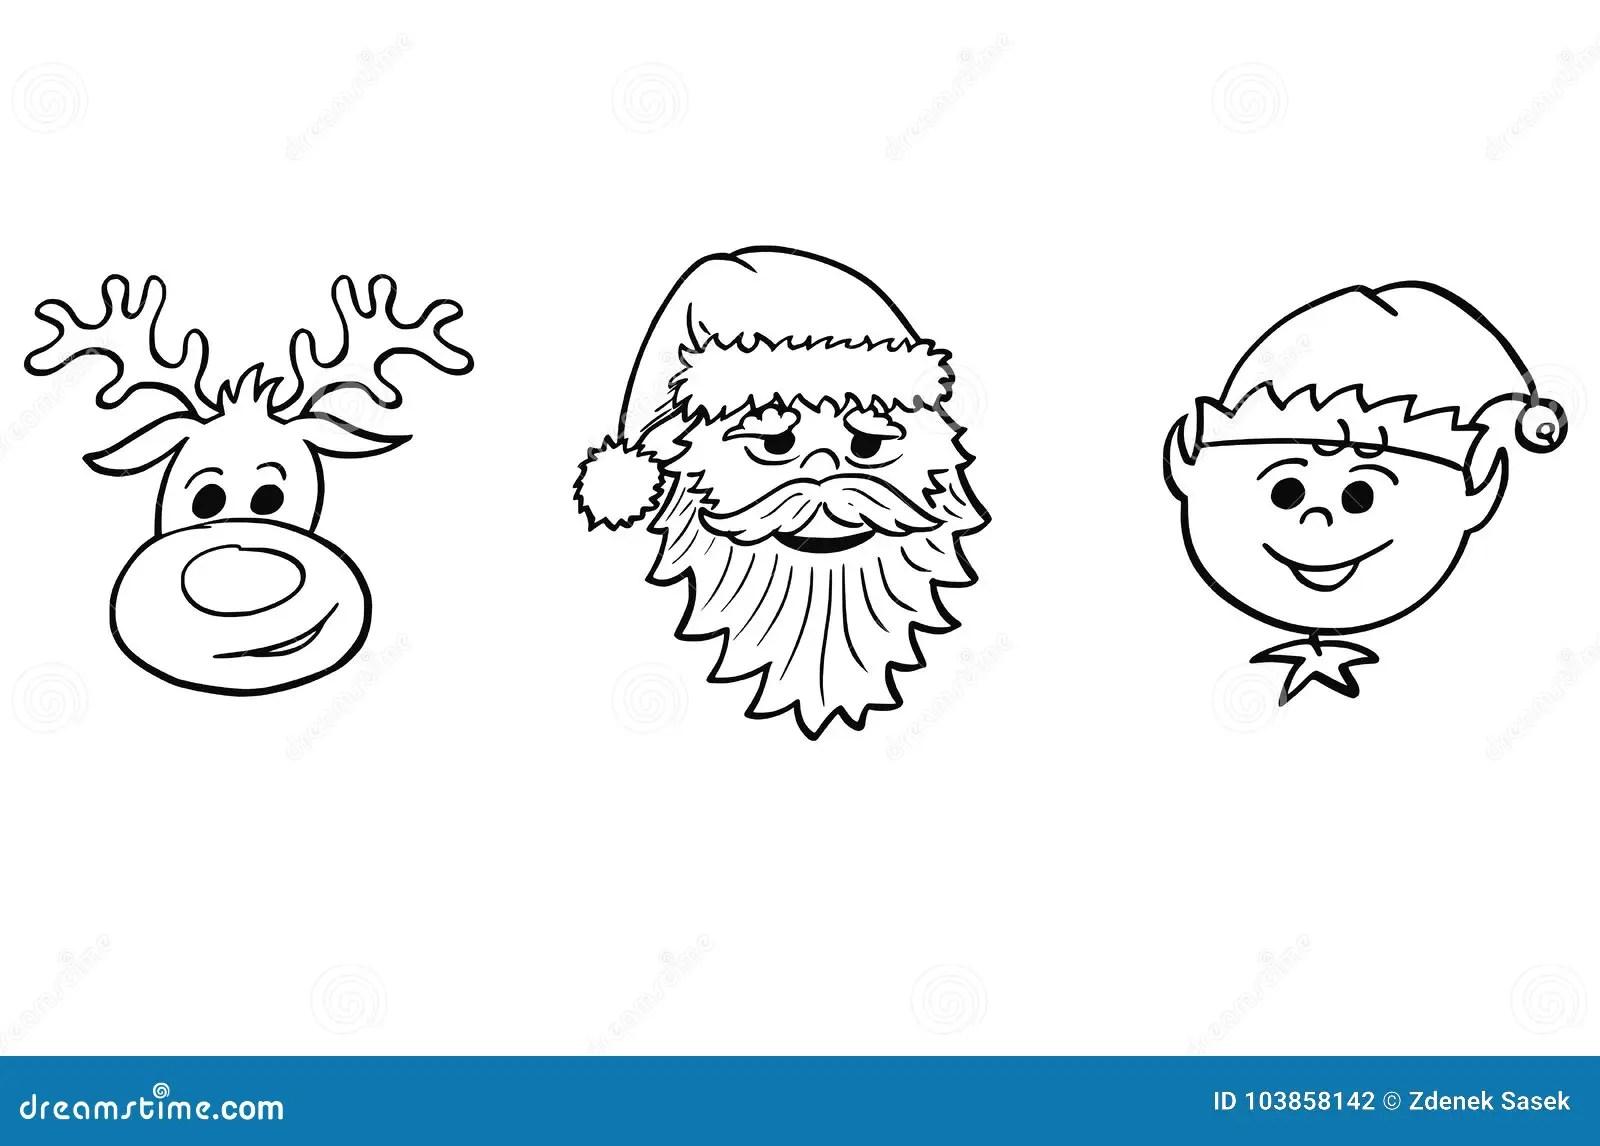 Christmas Set Of Santa Claus Elf And Rudolf The Reindeer